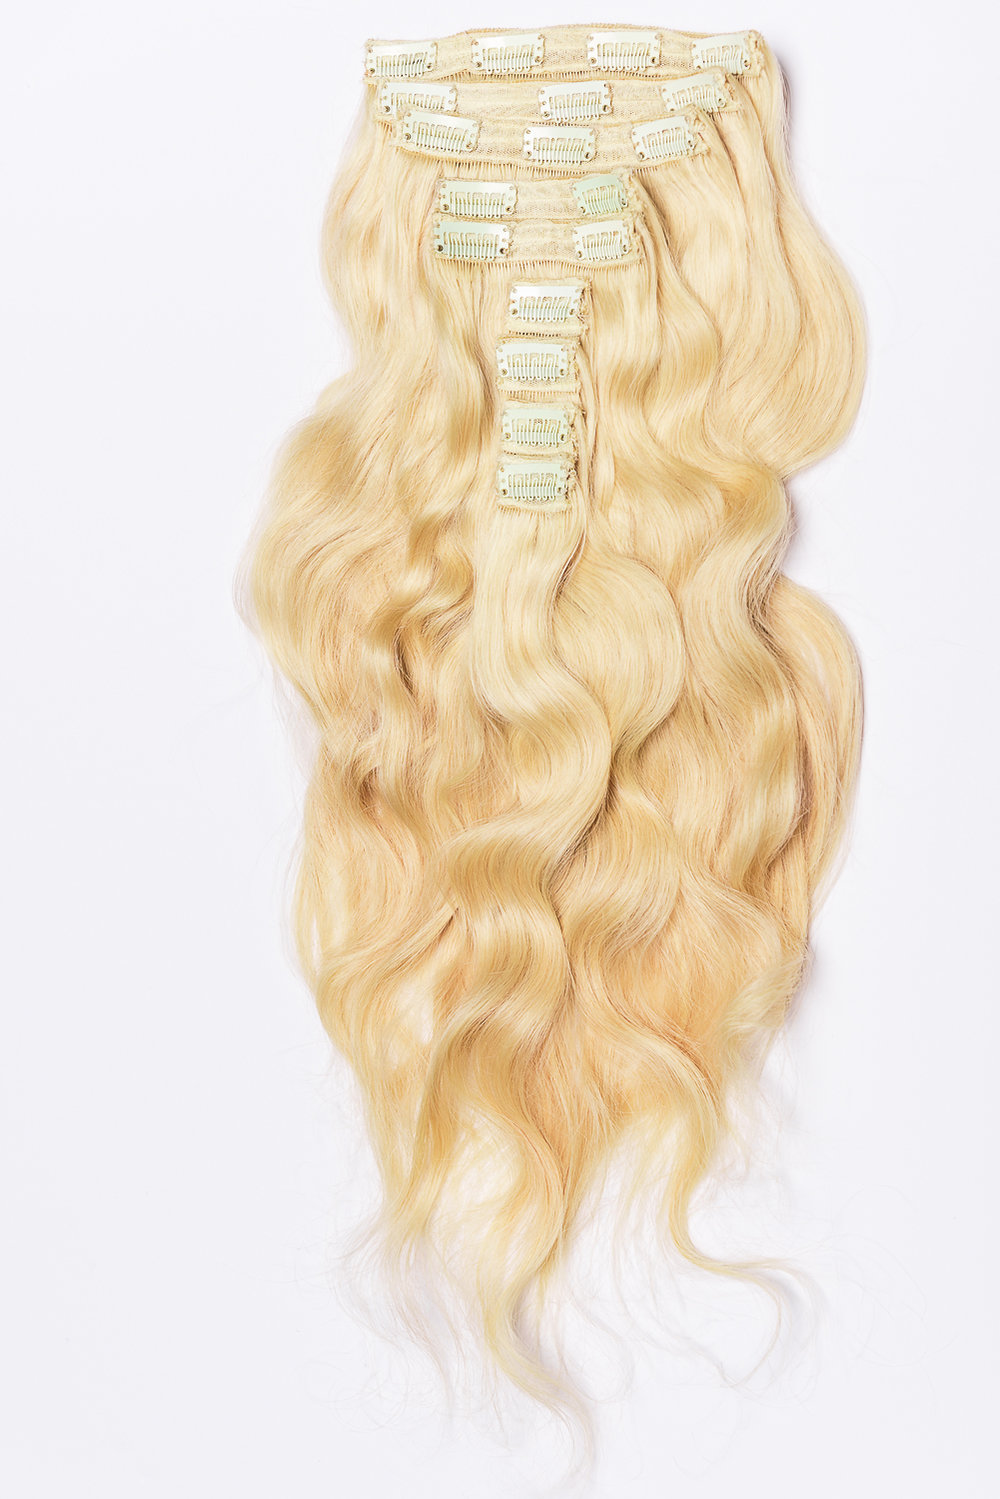 #22 Light Blonde